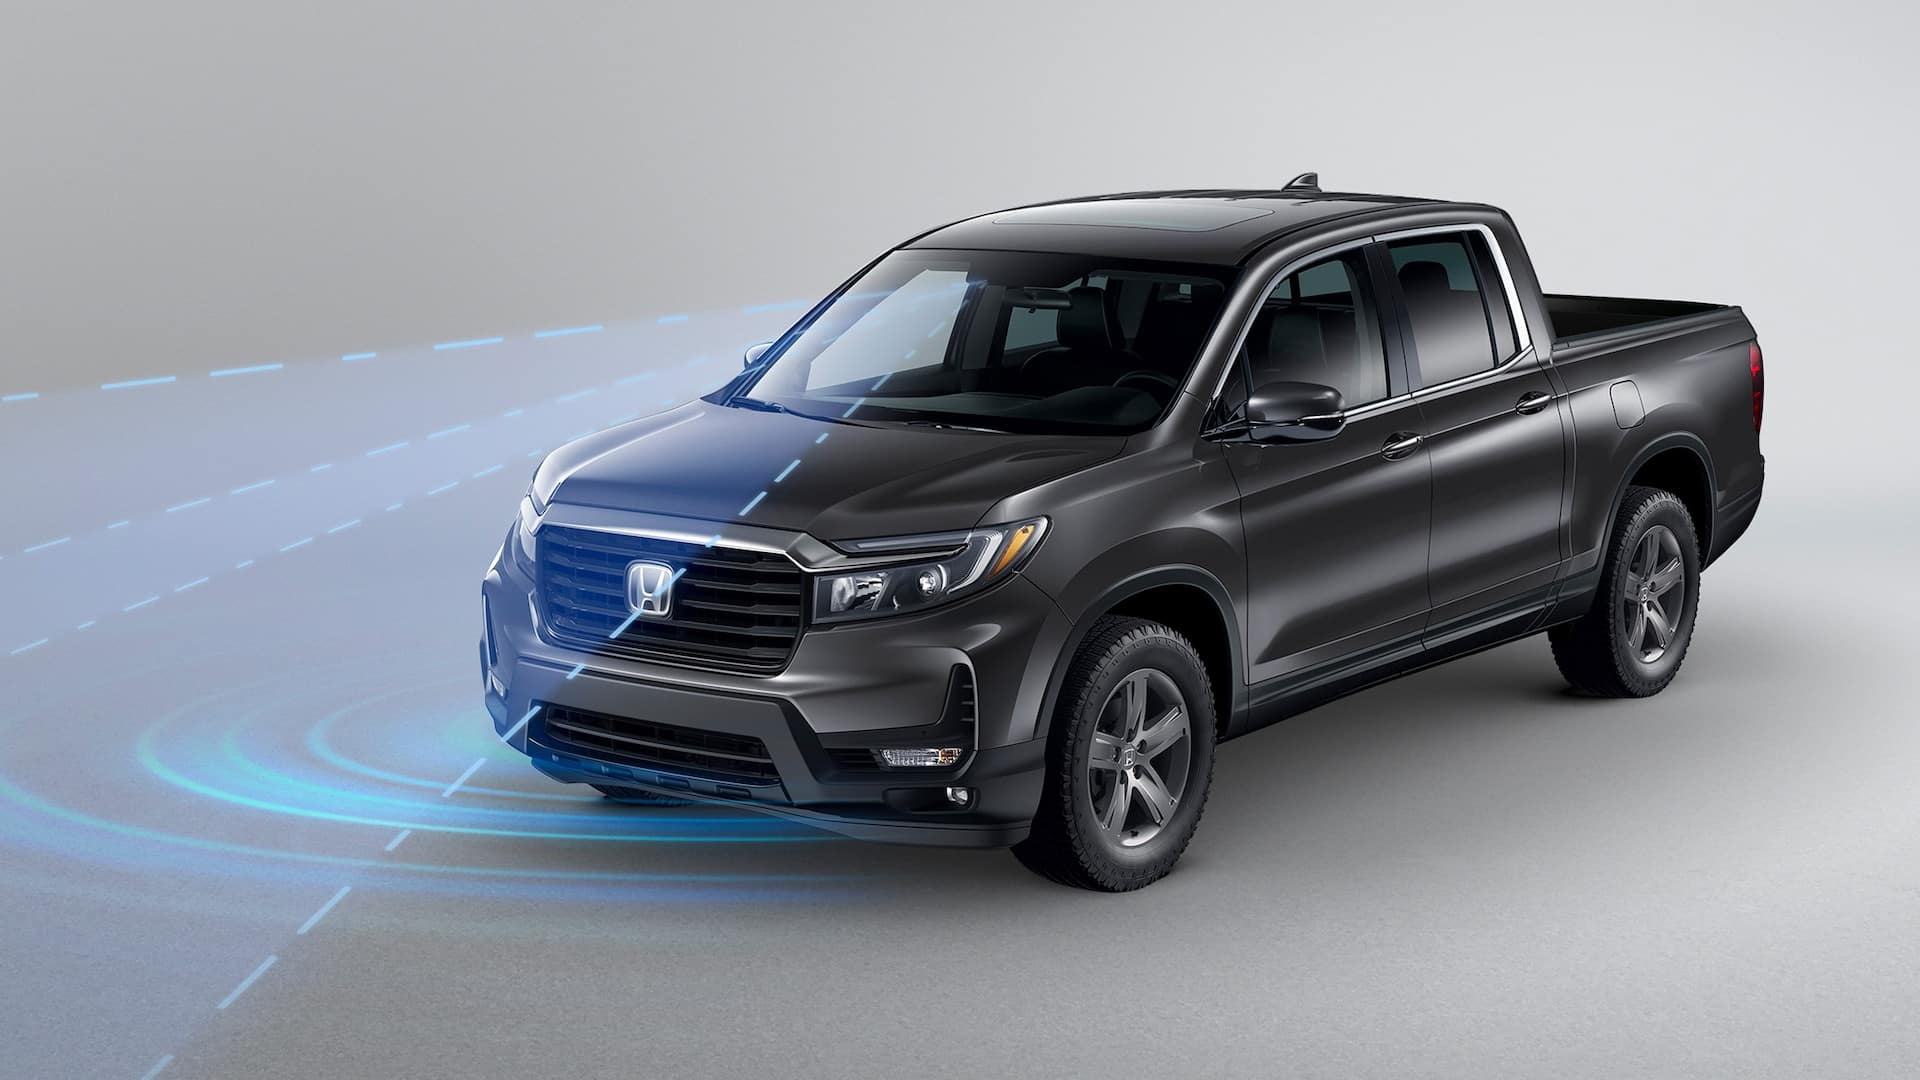 2021 Honda Ridgeline with standard Honda Sensing